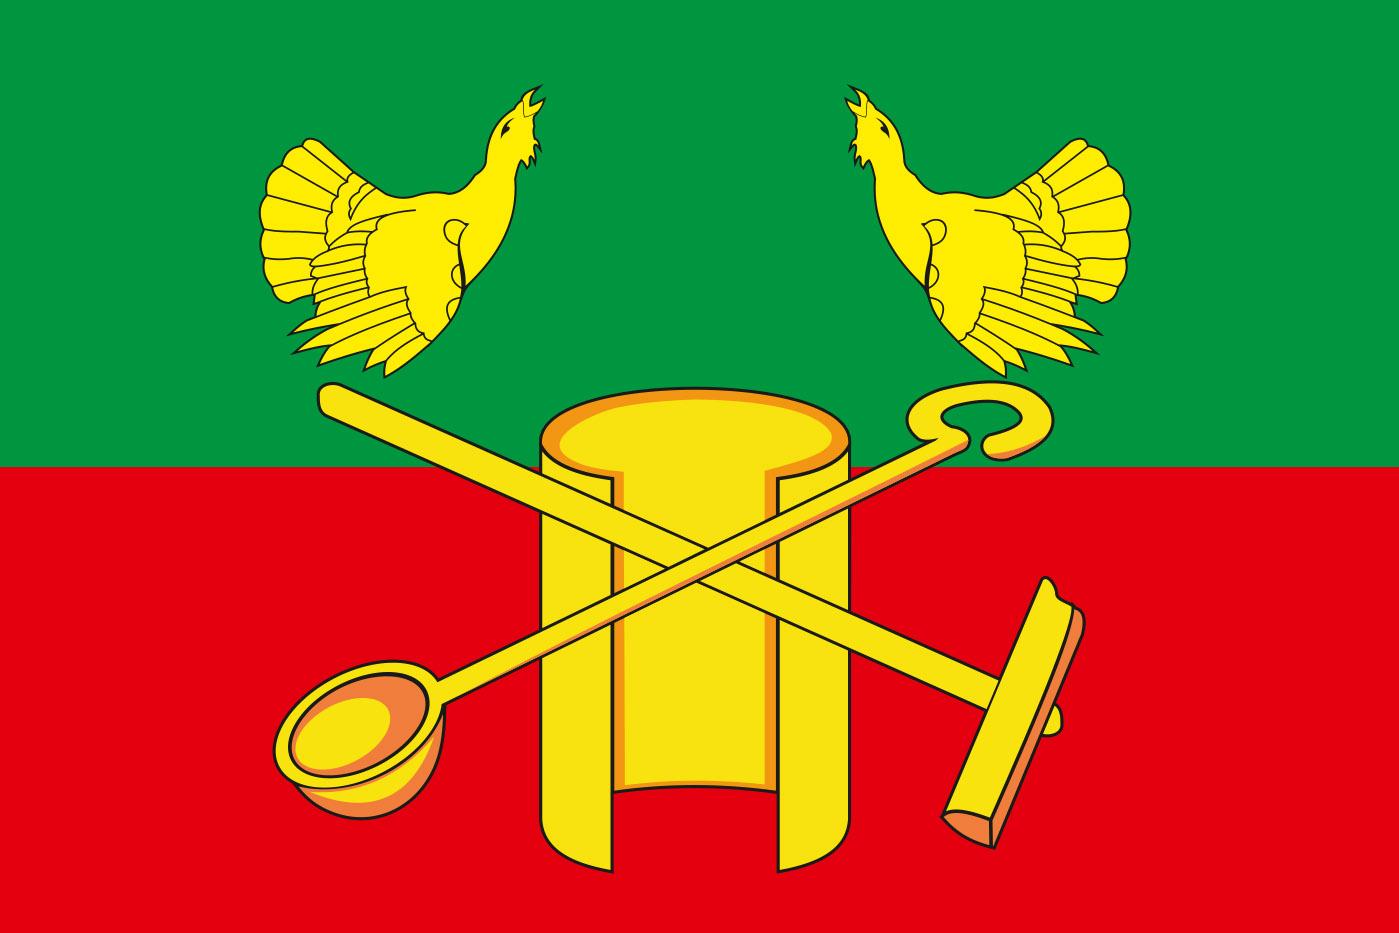 Флаг Кольчугино